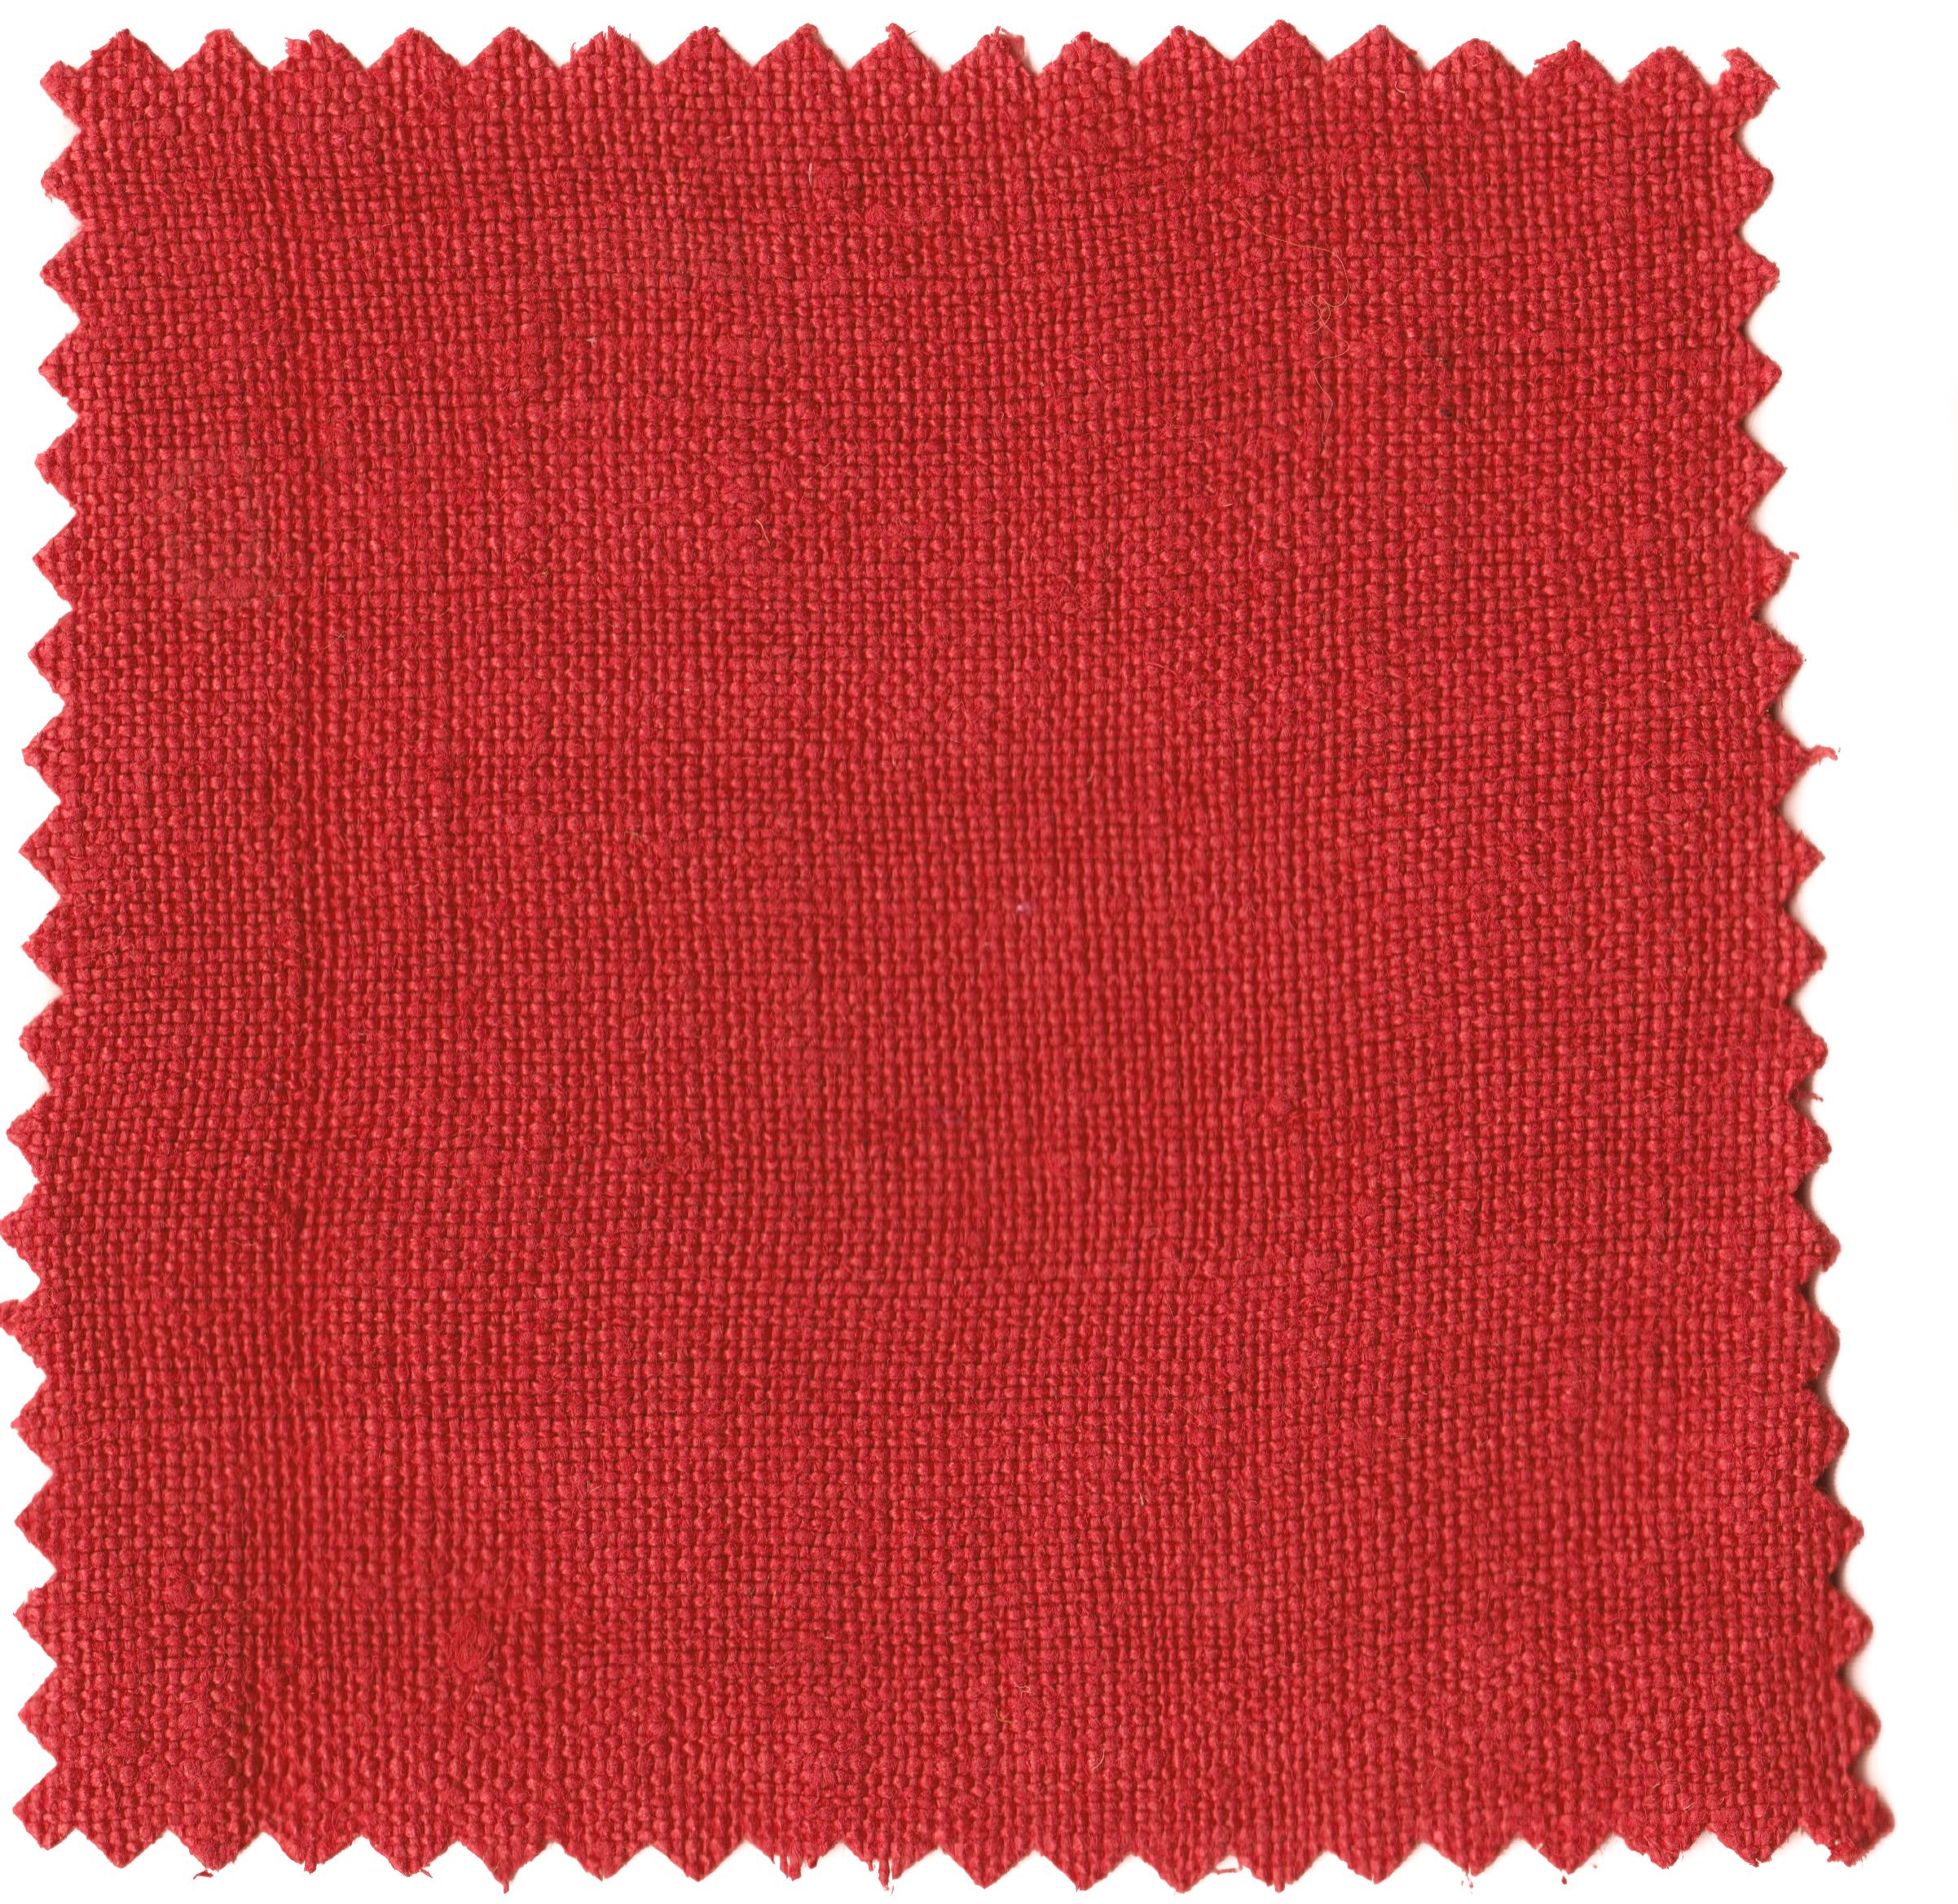 Flame Reds-1.jpg